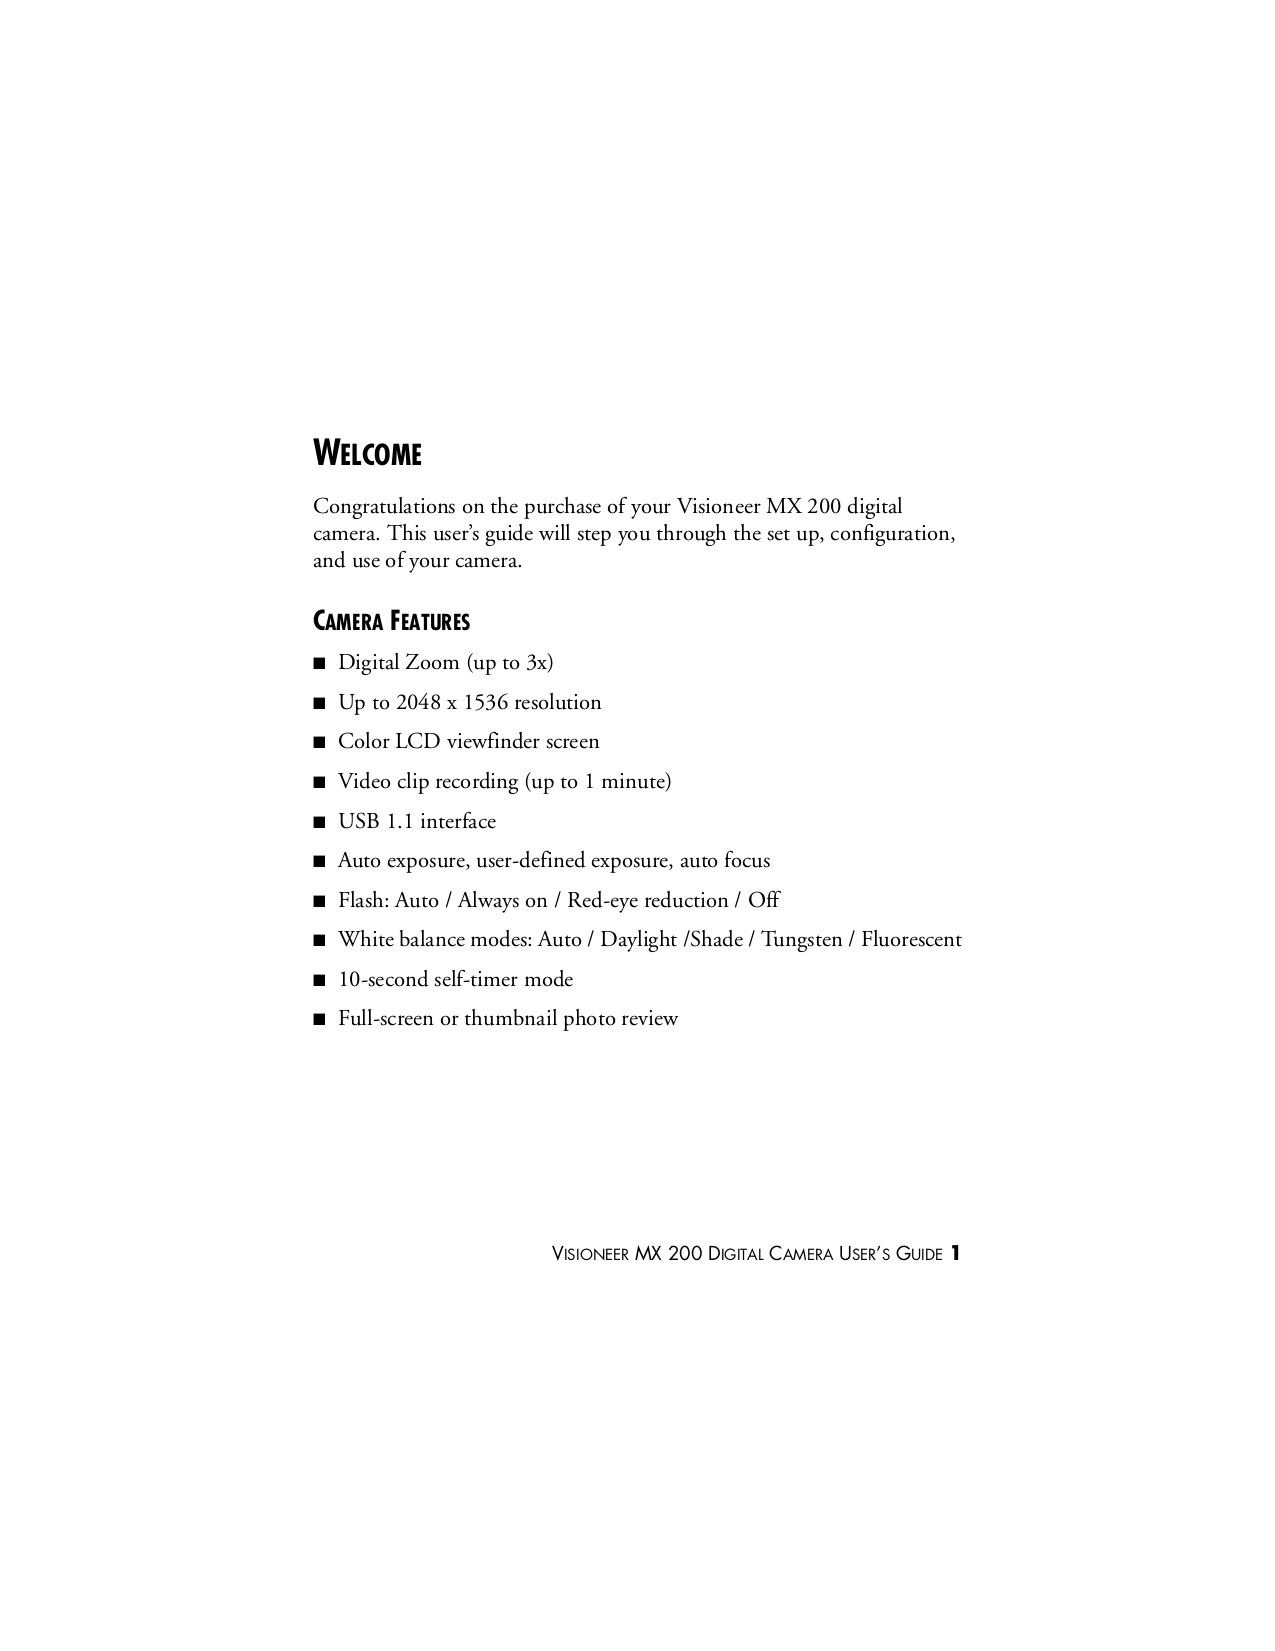 pdf manual for visioneer digital camera mx 200 rh umlib com Omni 2 Digital Camera Manual Sony Digital Camera Manual